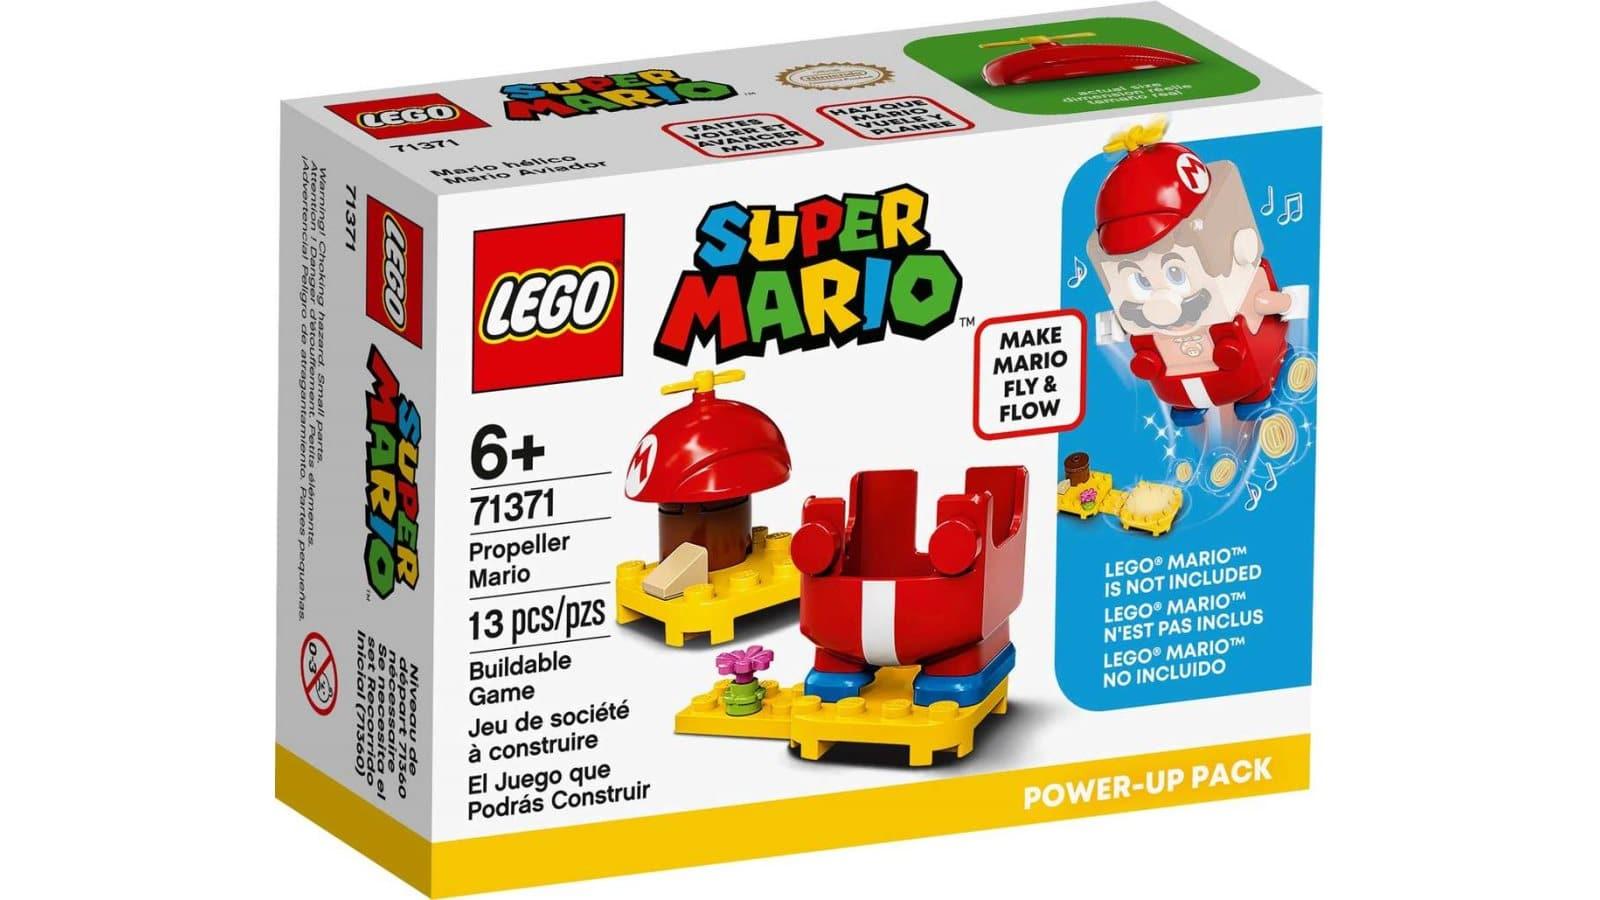 LEGO 71371 Propeller Mario Power-Up Pack - אריזה